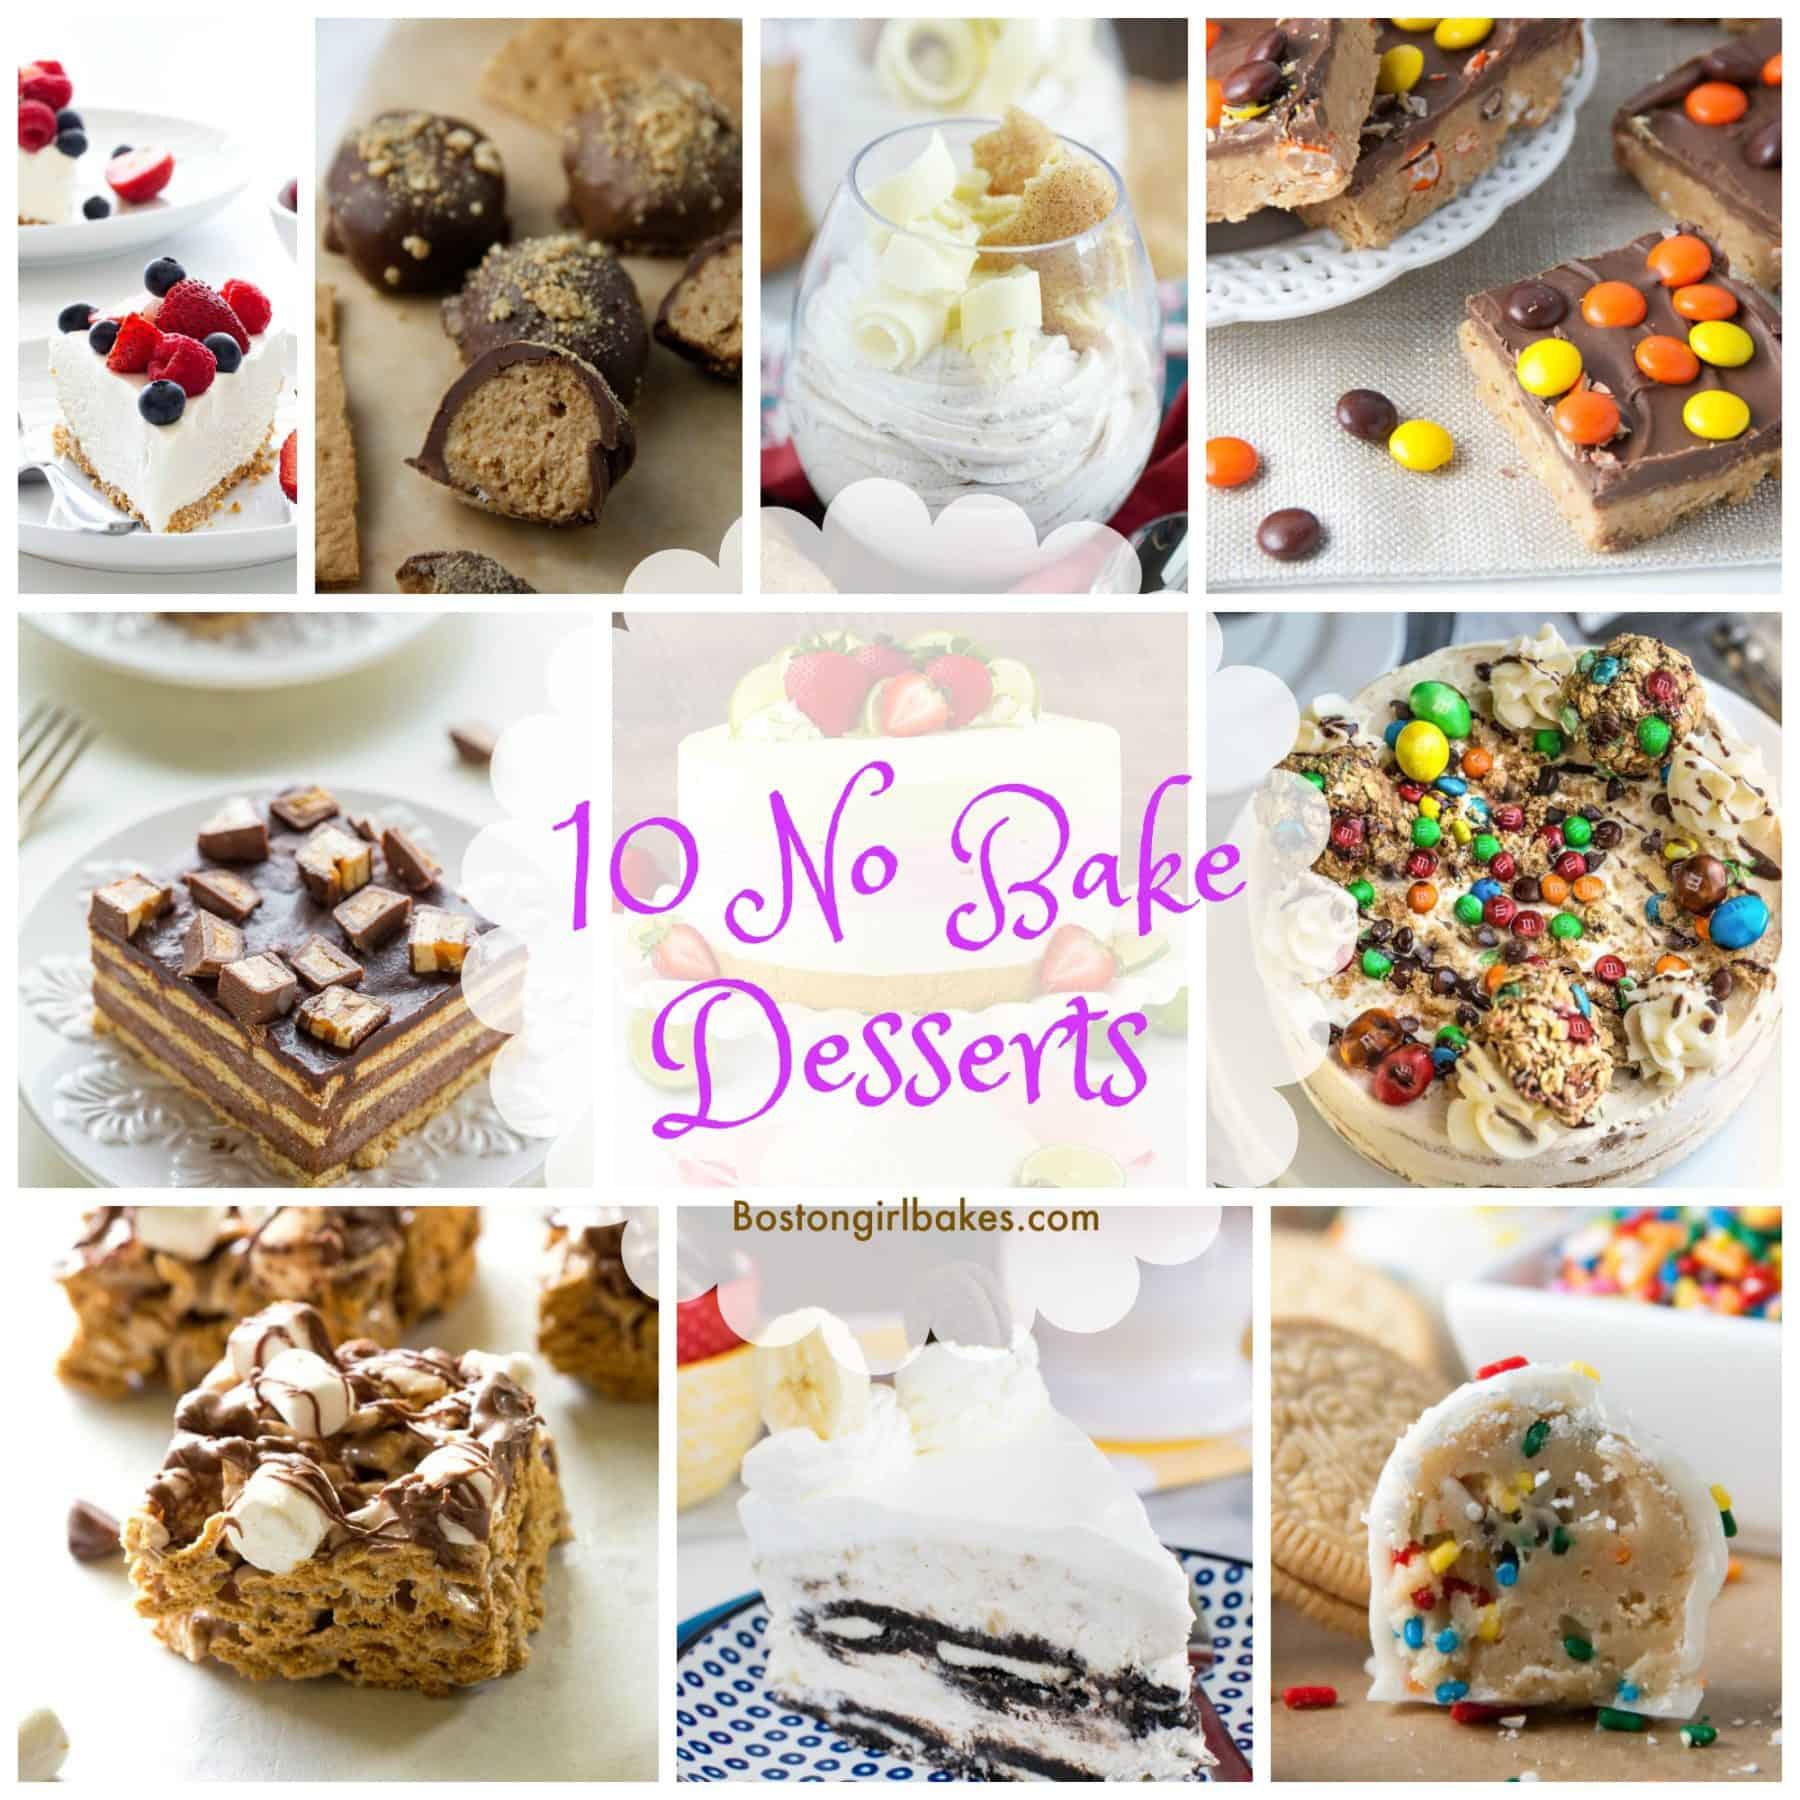 10 No Bake Desserts